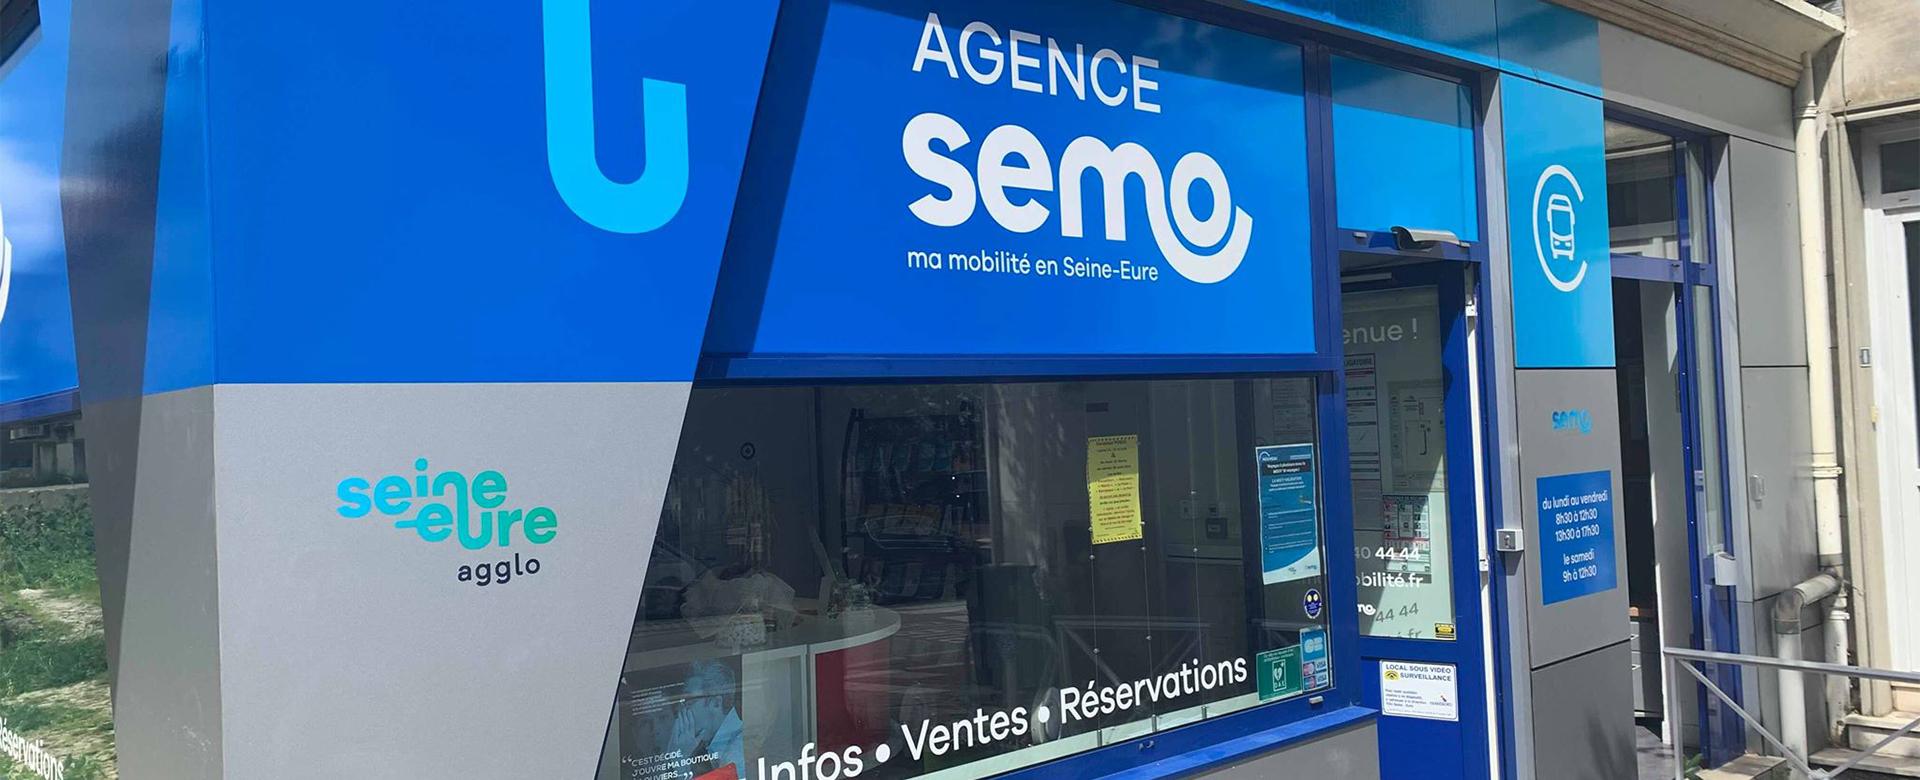 Agence Semo